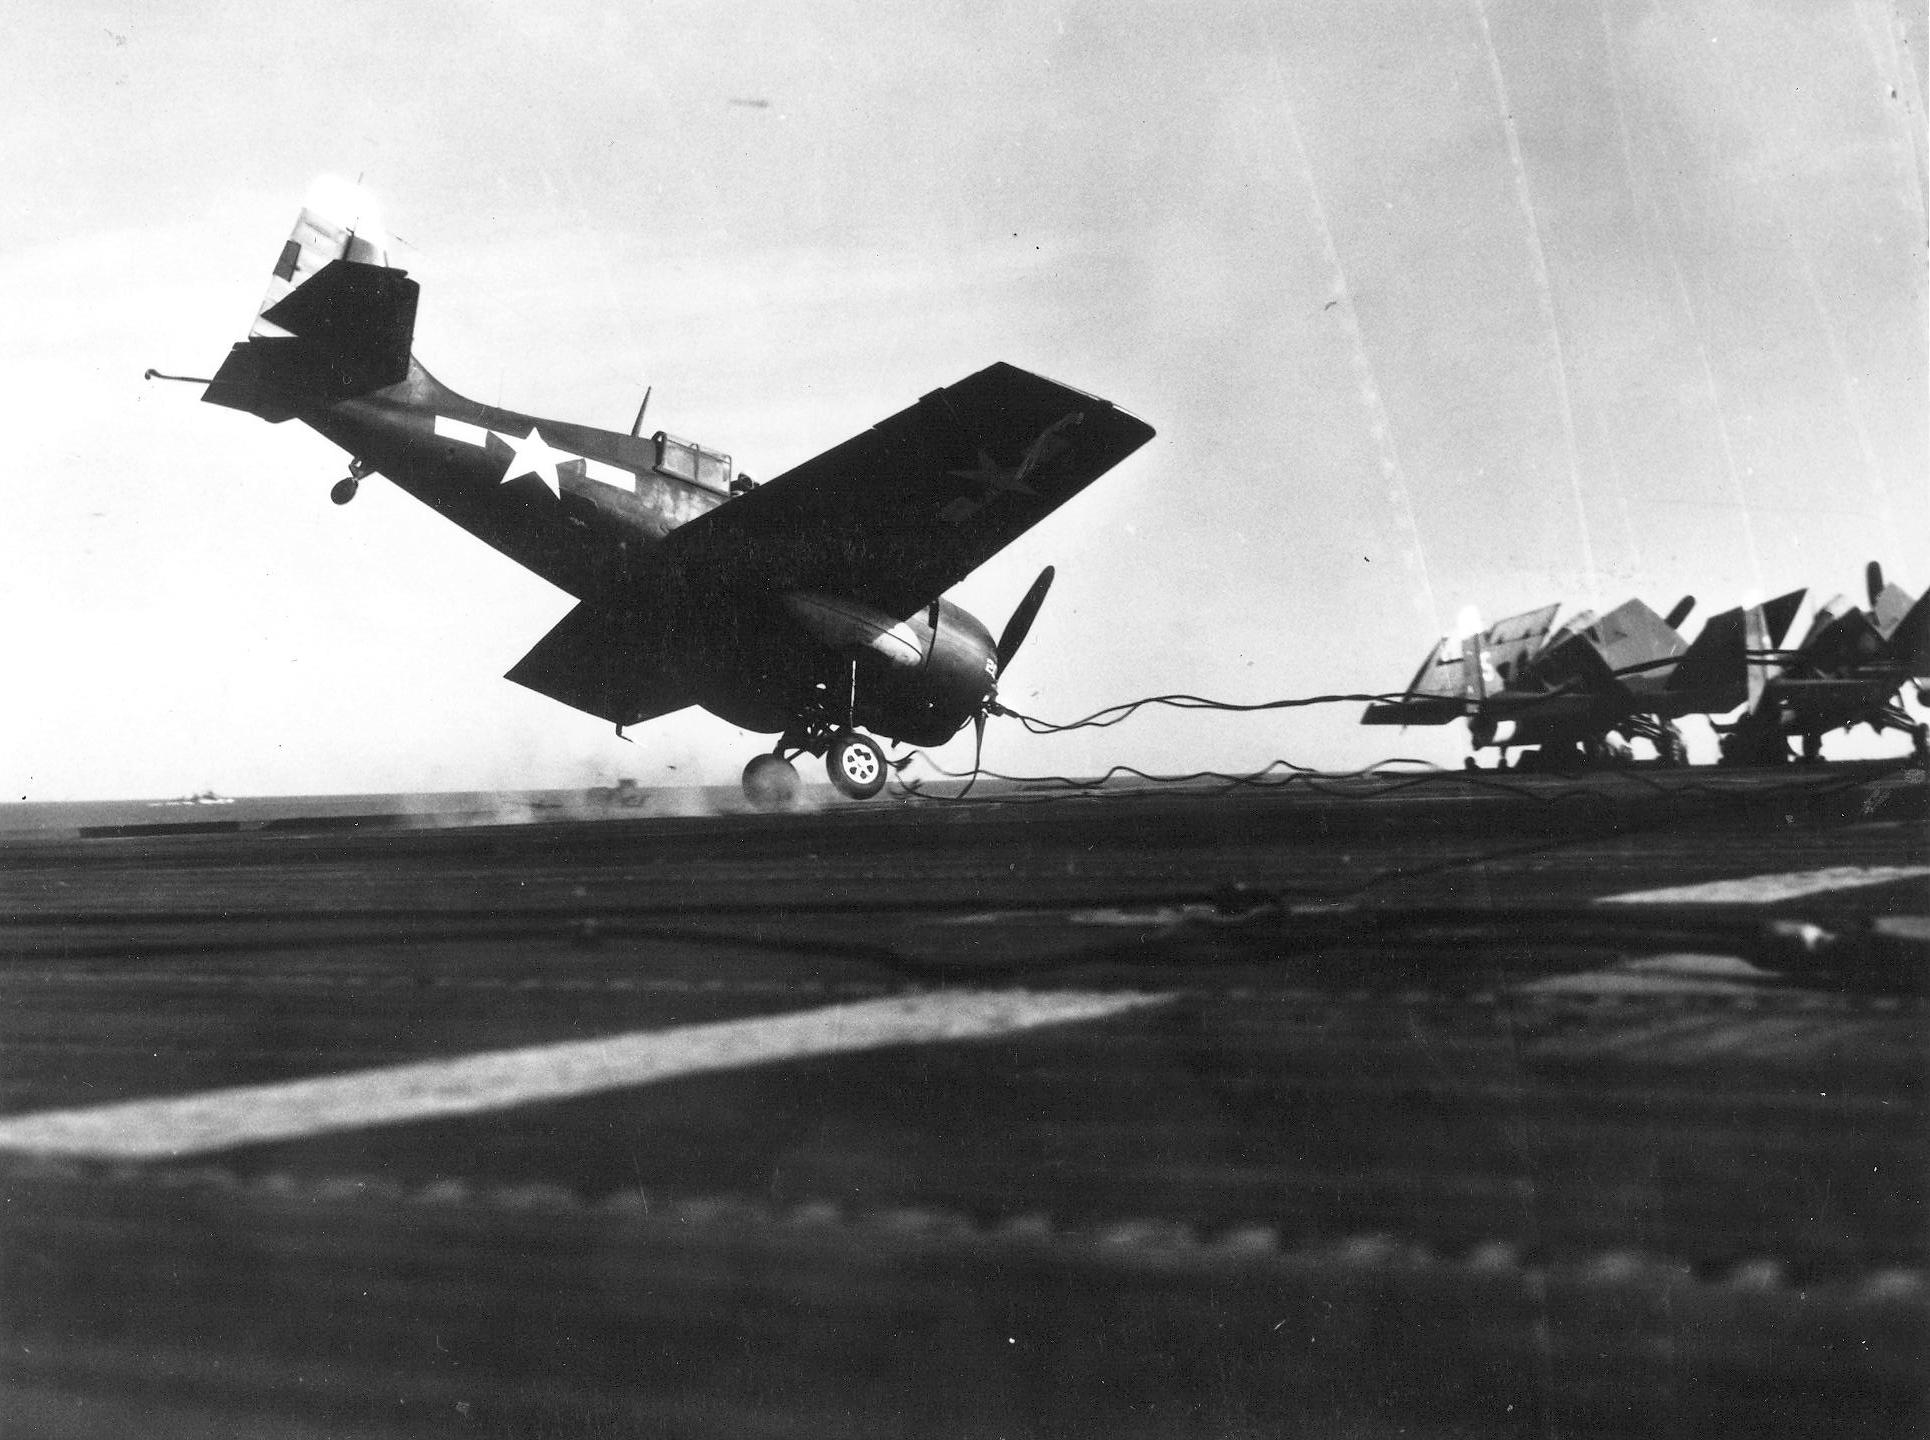 FM 2 Wildcat VC 81 White 21 landing mishap CVE 62 USS Natoma Bay 1944 01